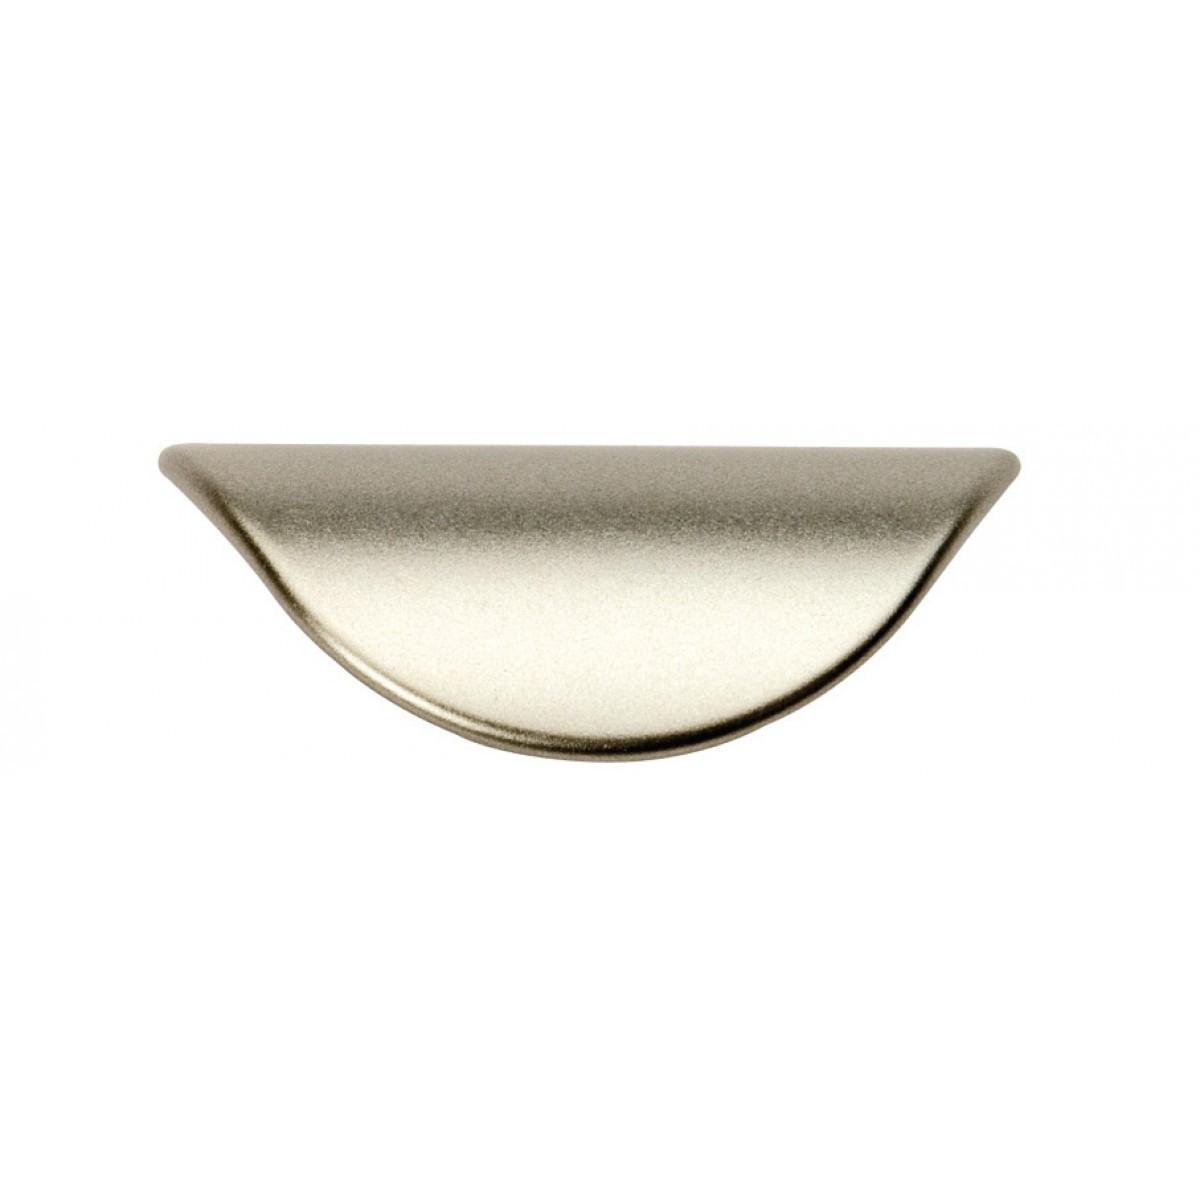 Ручка мебельная Ozkardesler 5118-02 MIDYE 32мм Сатин